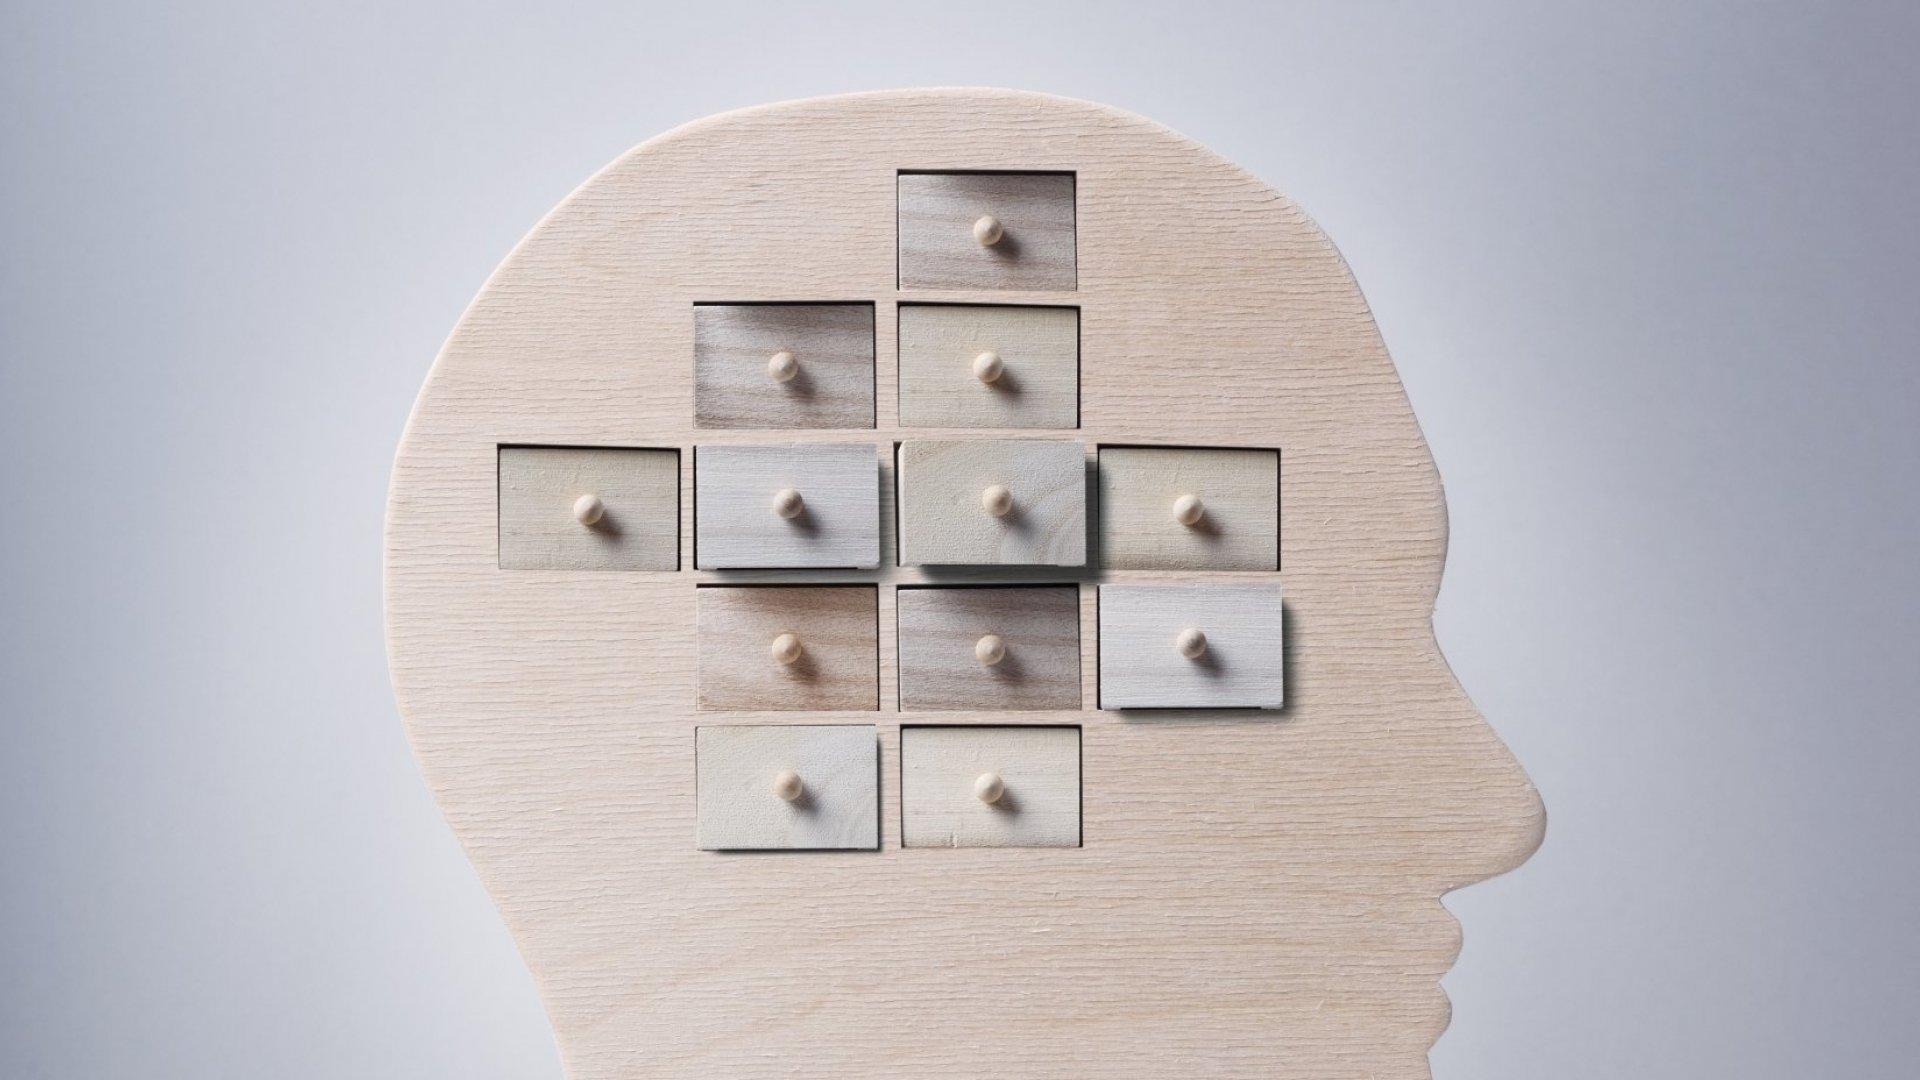 One Brain Skill That Will Make You Creative